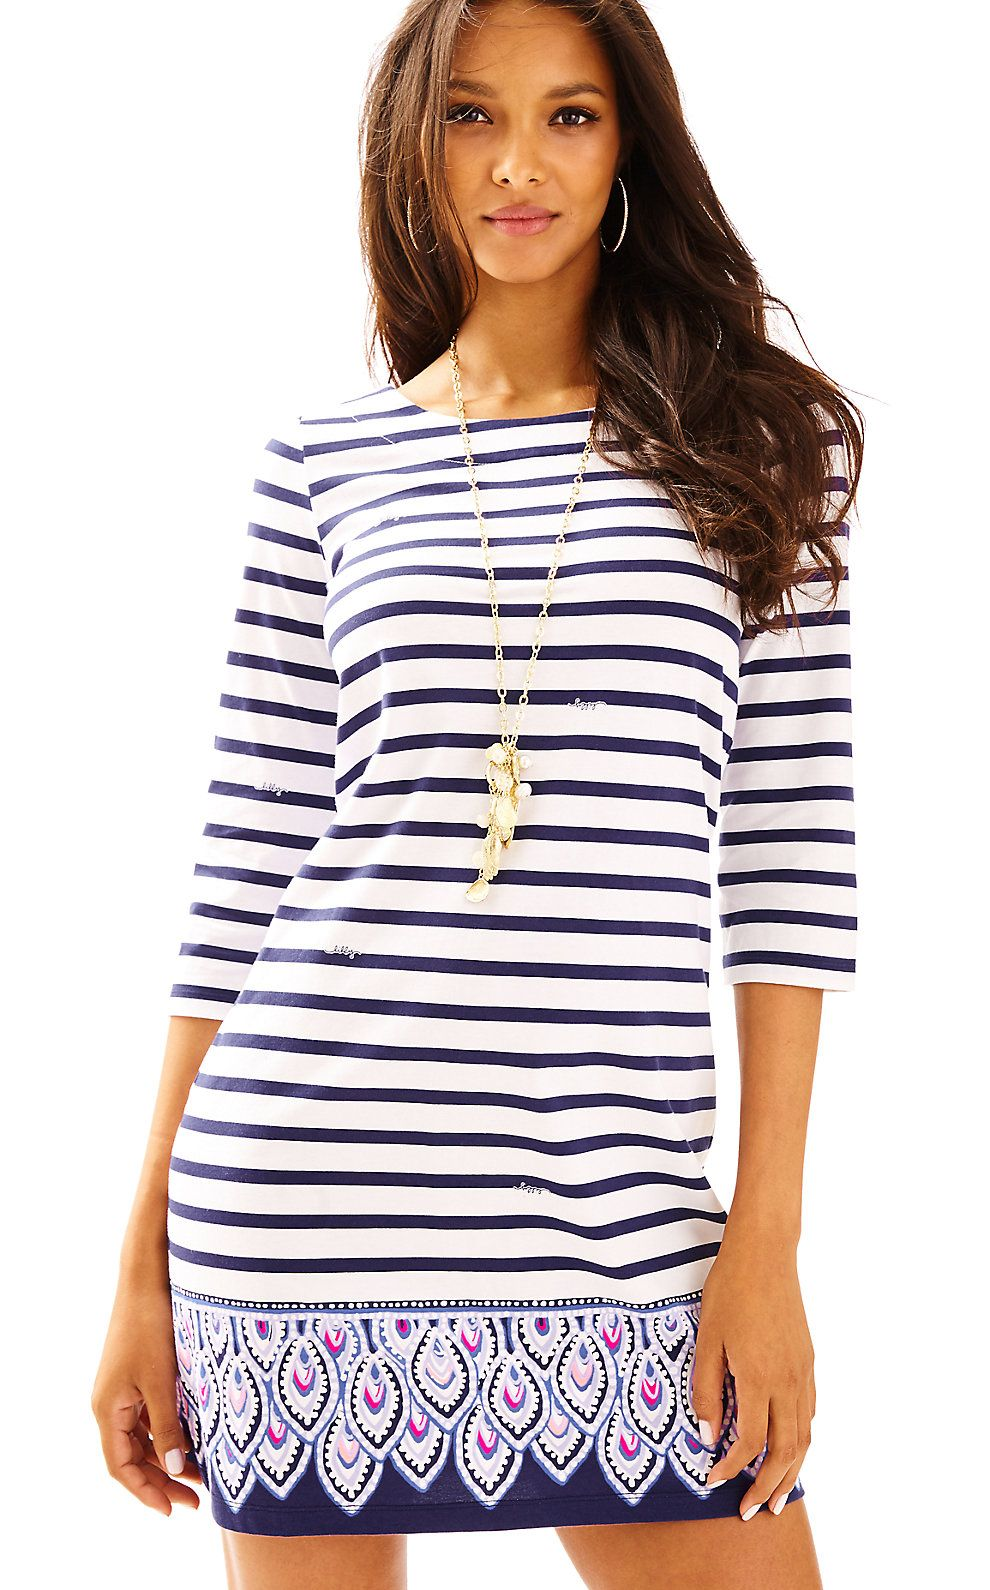 ec93b715a86 Lilly Pulitzer Womens Bay Dress